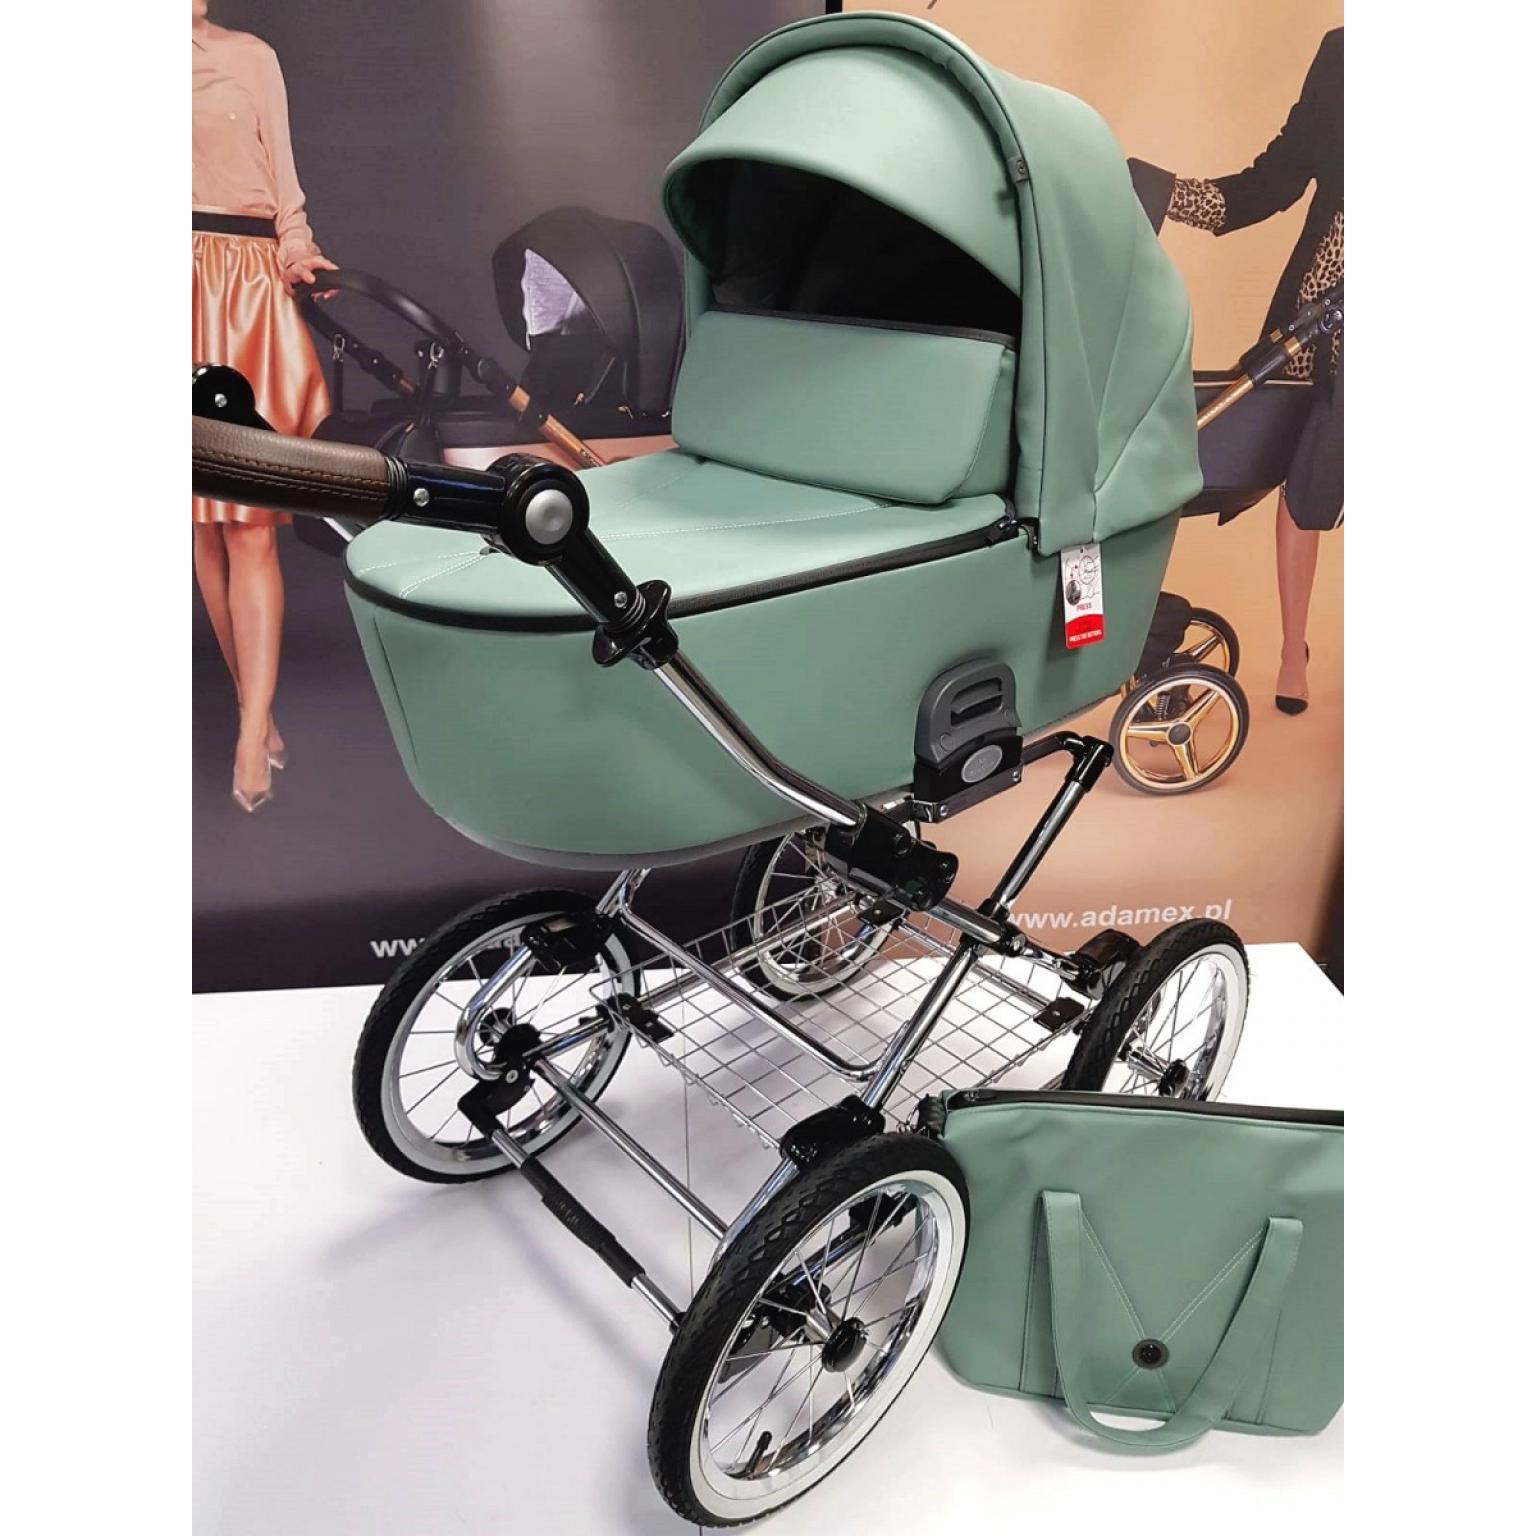 Bērnu-rati-Roan-Bass-Next-classic-eco-āda-Misty-Mint-детская-коляска-roan-bass-next-Classic-2